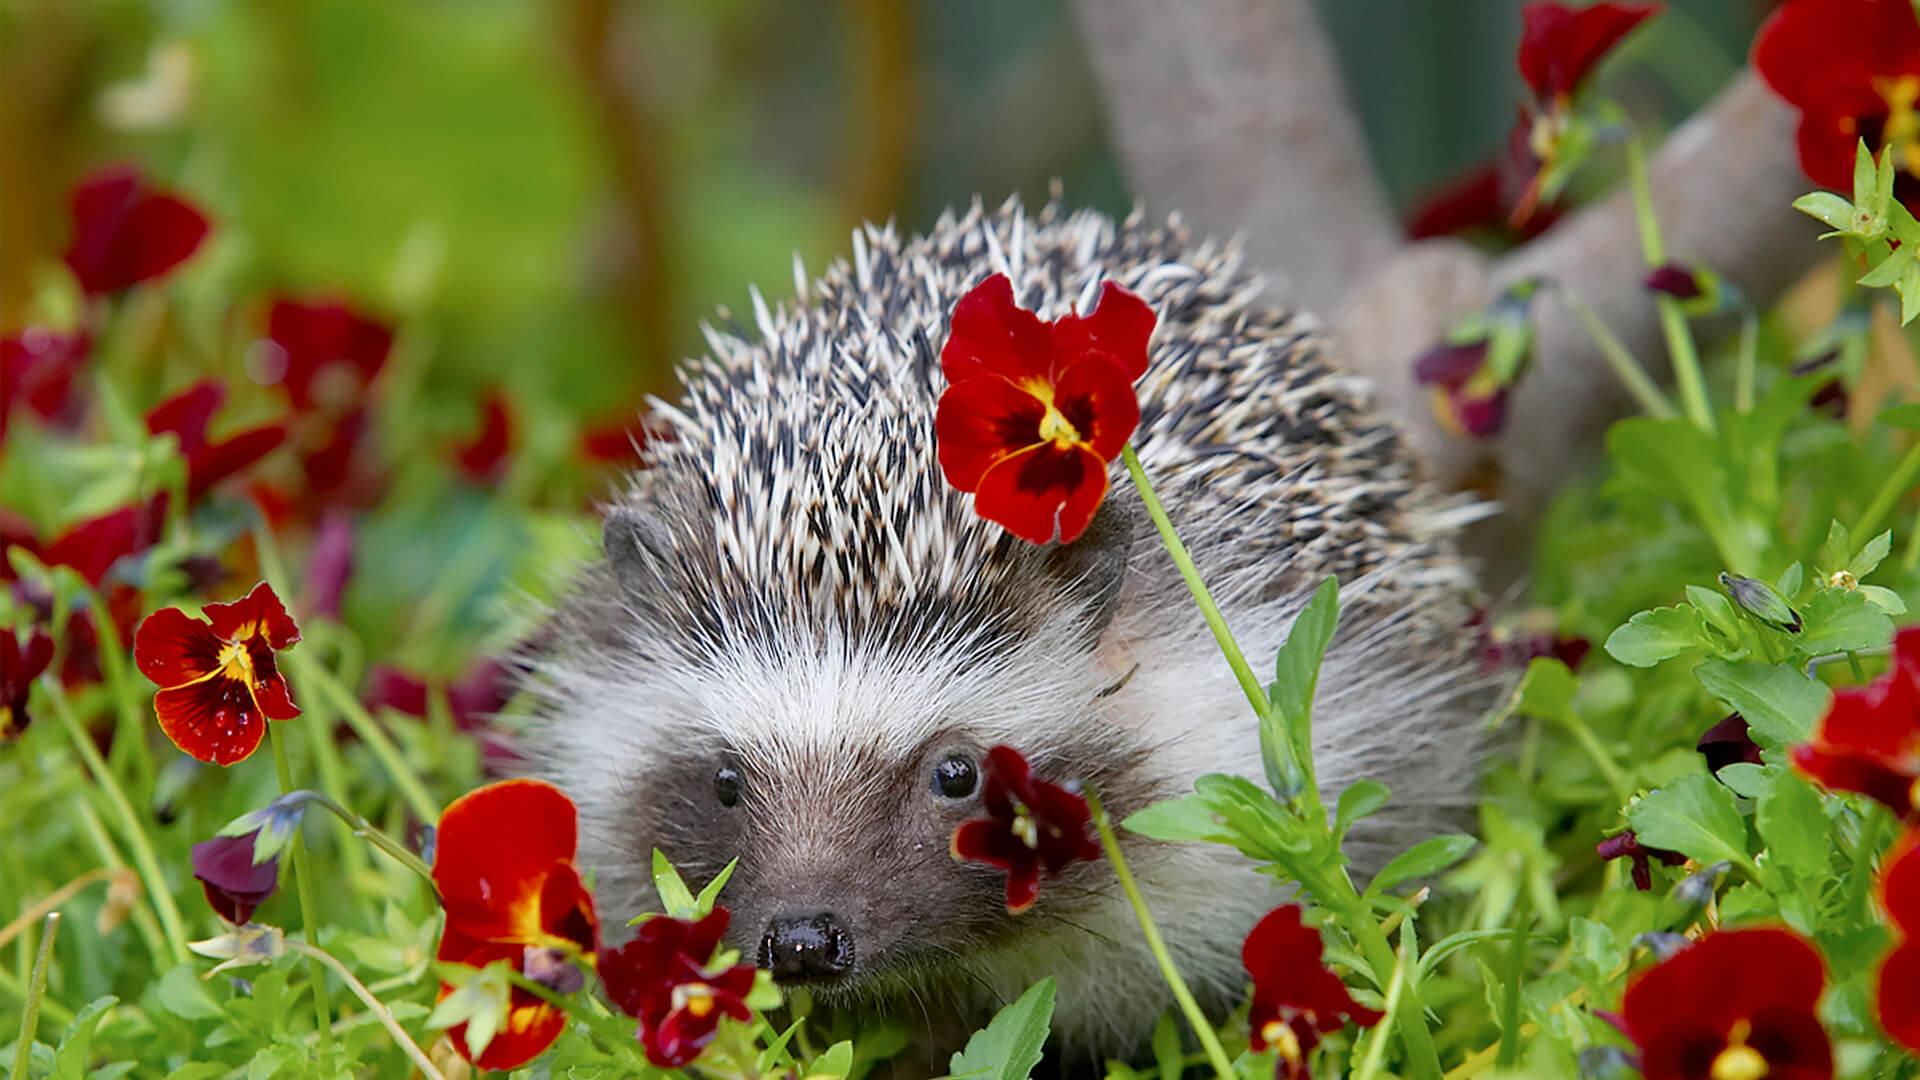 Hedgehog | San Diego Zoo Animals & Plants